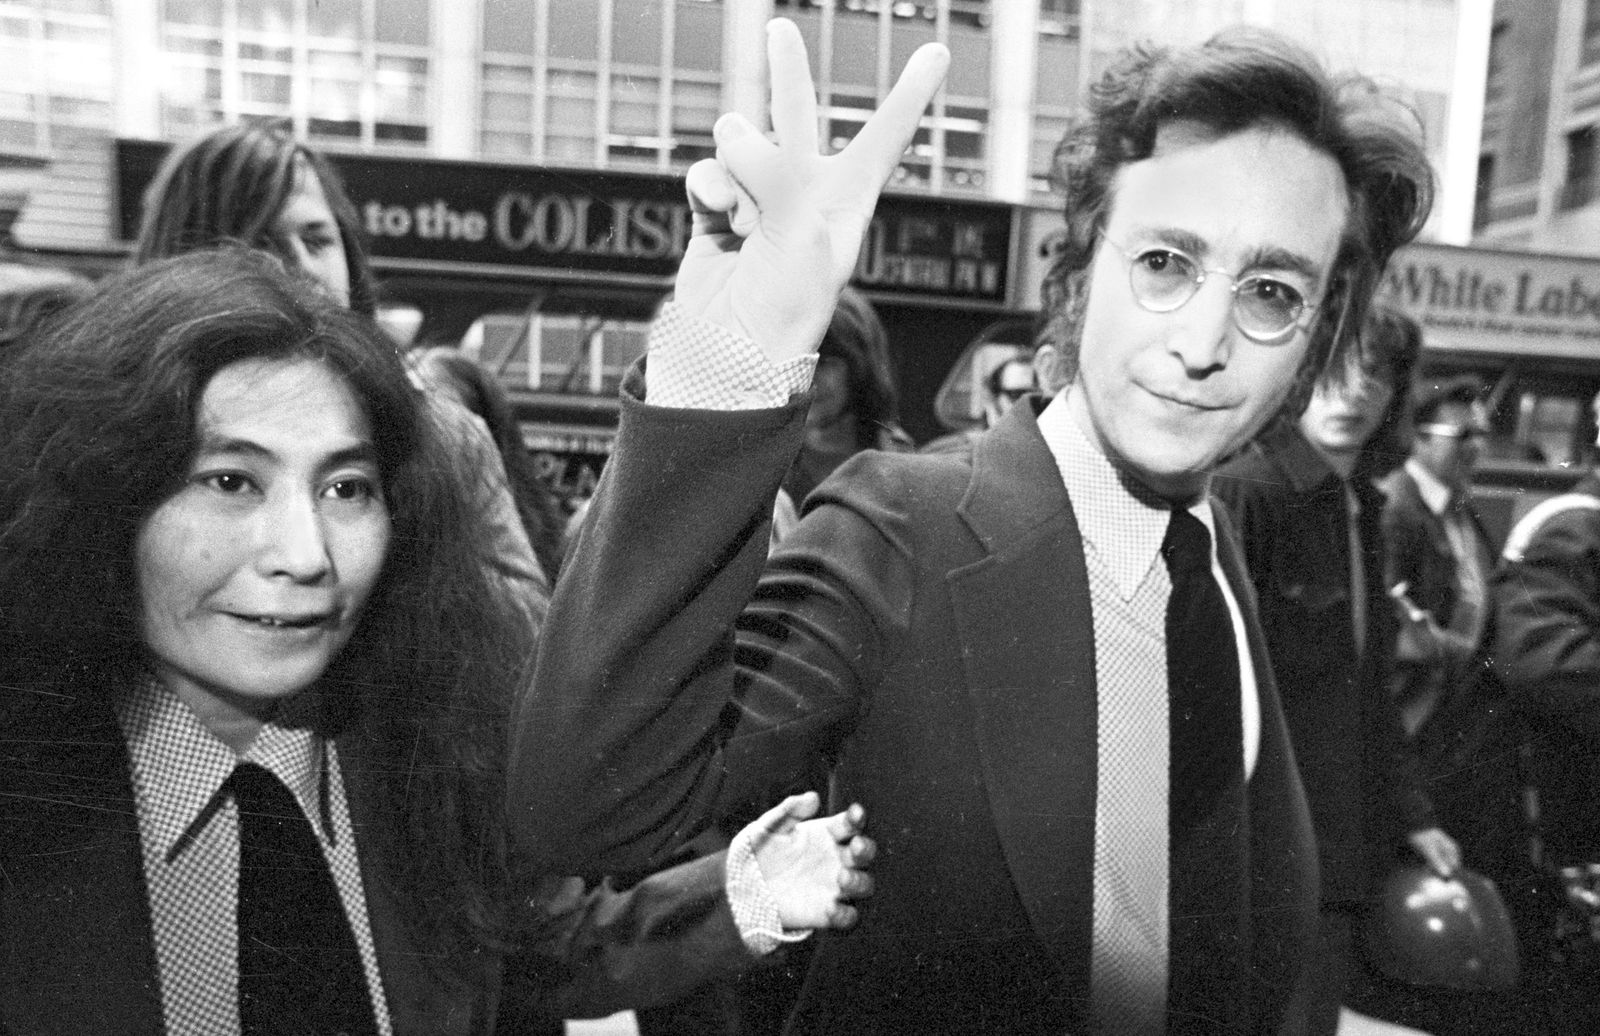 Ono Lennon